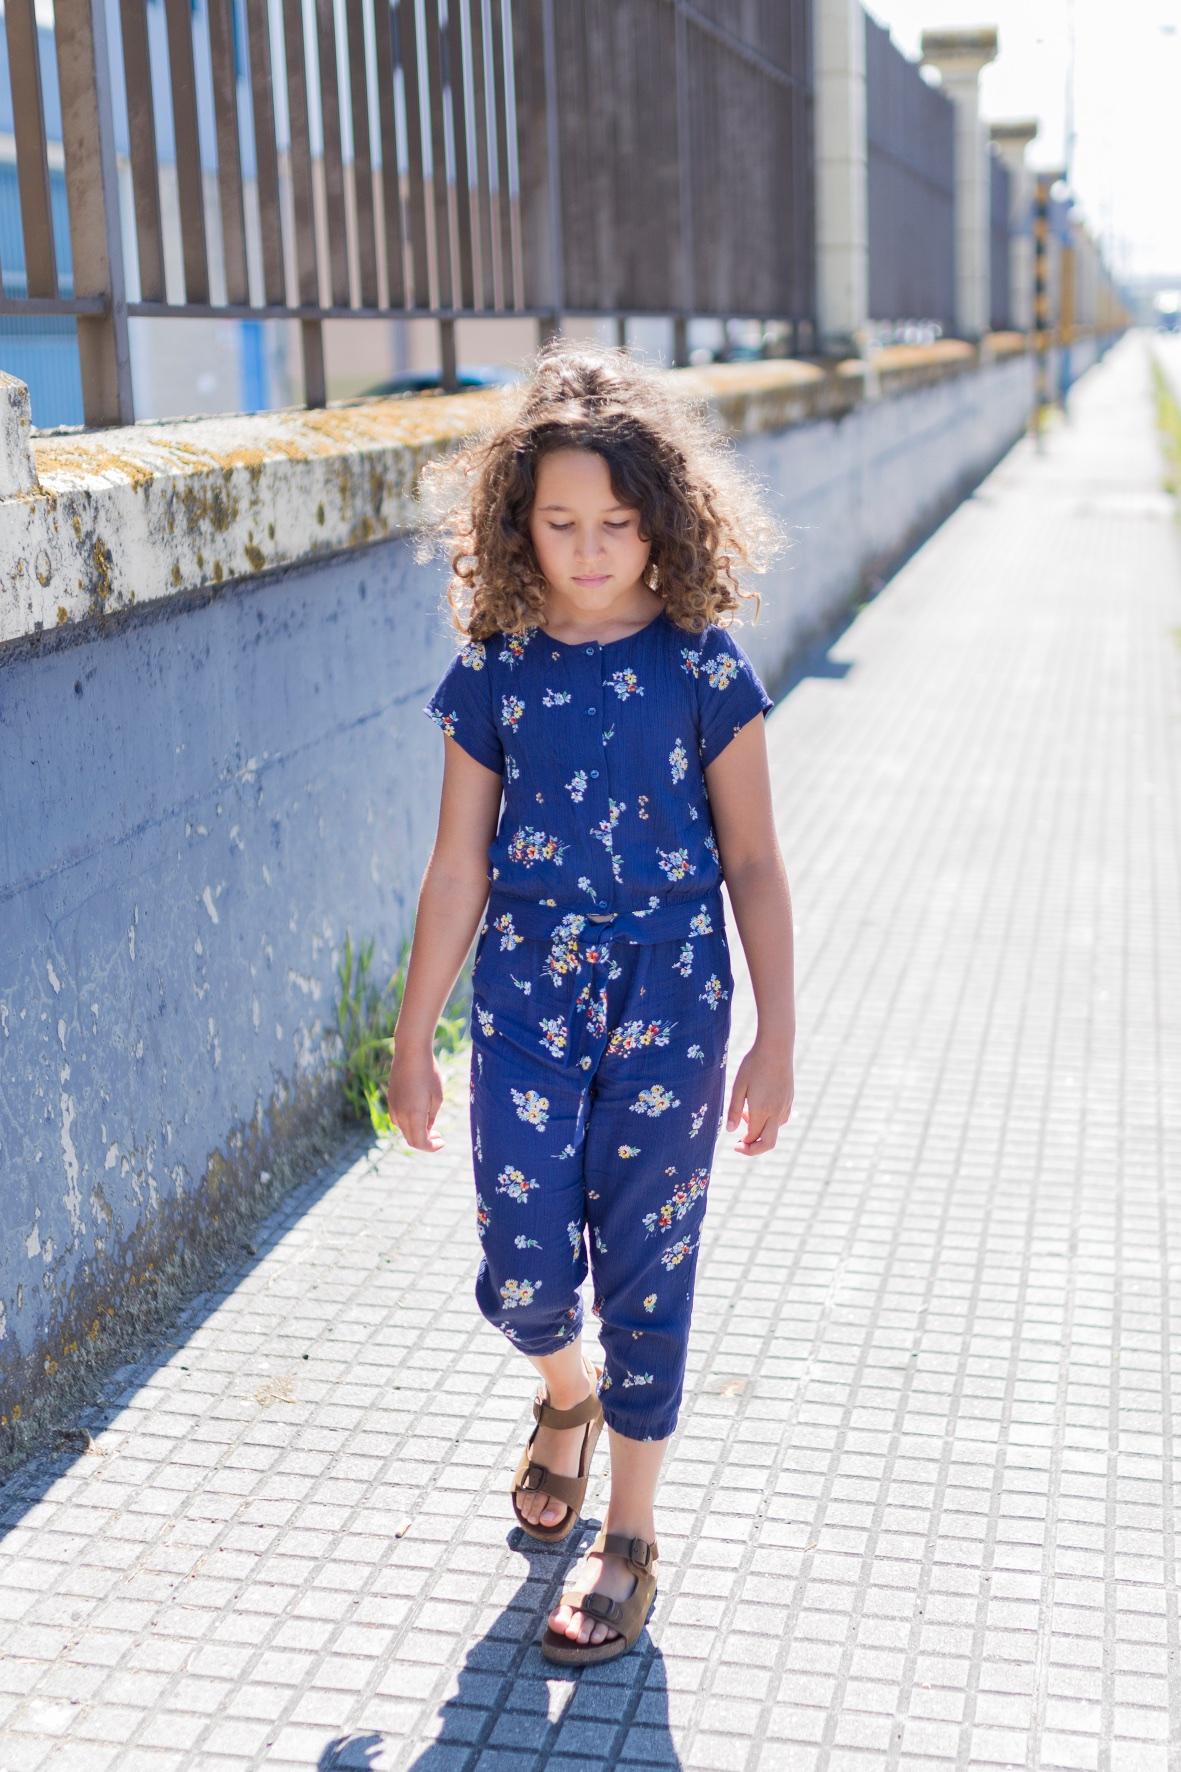 zippy sandals-miniblogger-descalzaporelparque -coruña -jimena - jimena look- jumpsuit -kids -miniblogger - moda infantil -mono -niños- Soft -soft de ZARA KIDS - streestyle- style -zara-zara kids